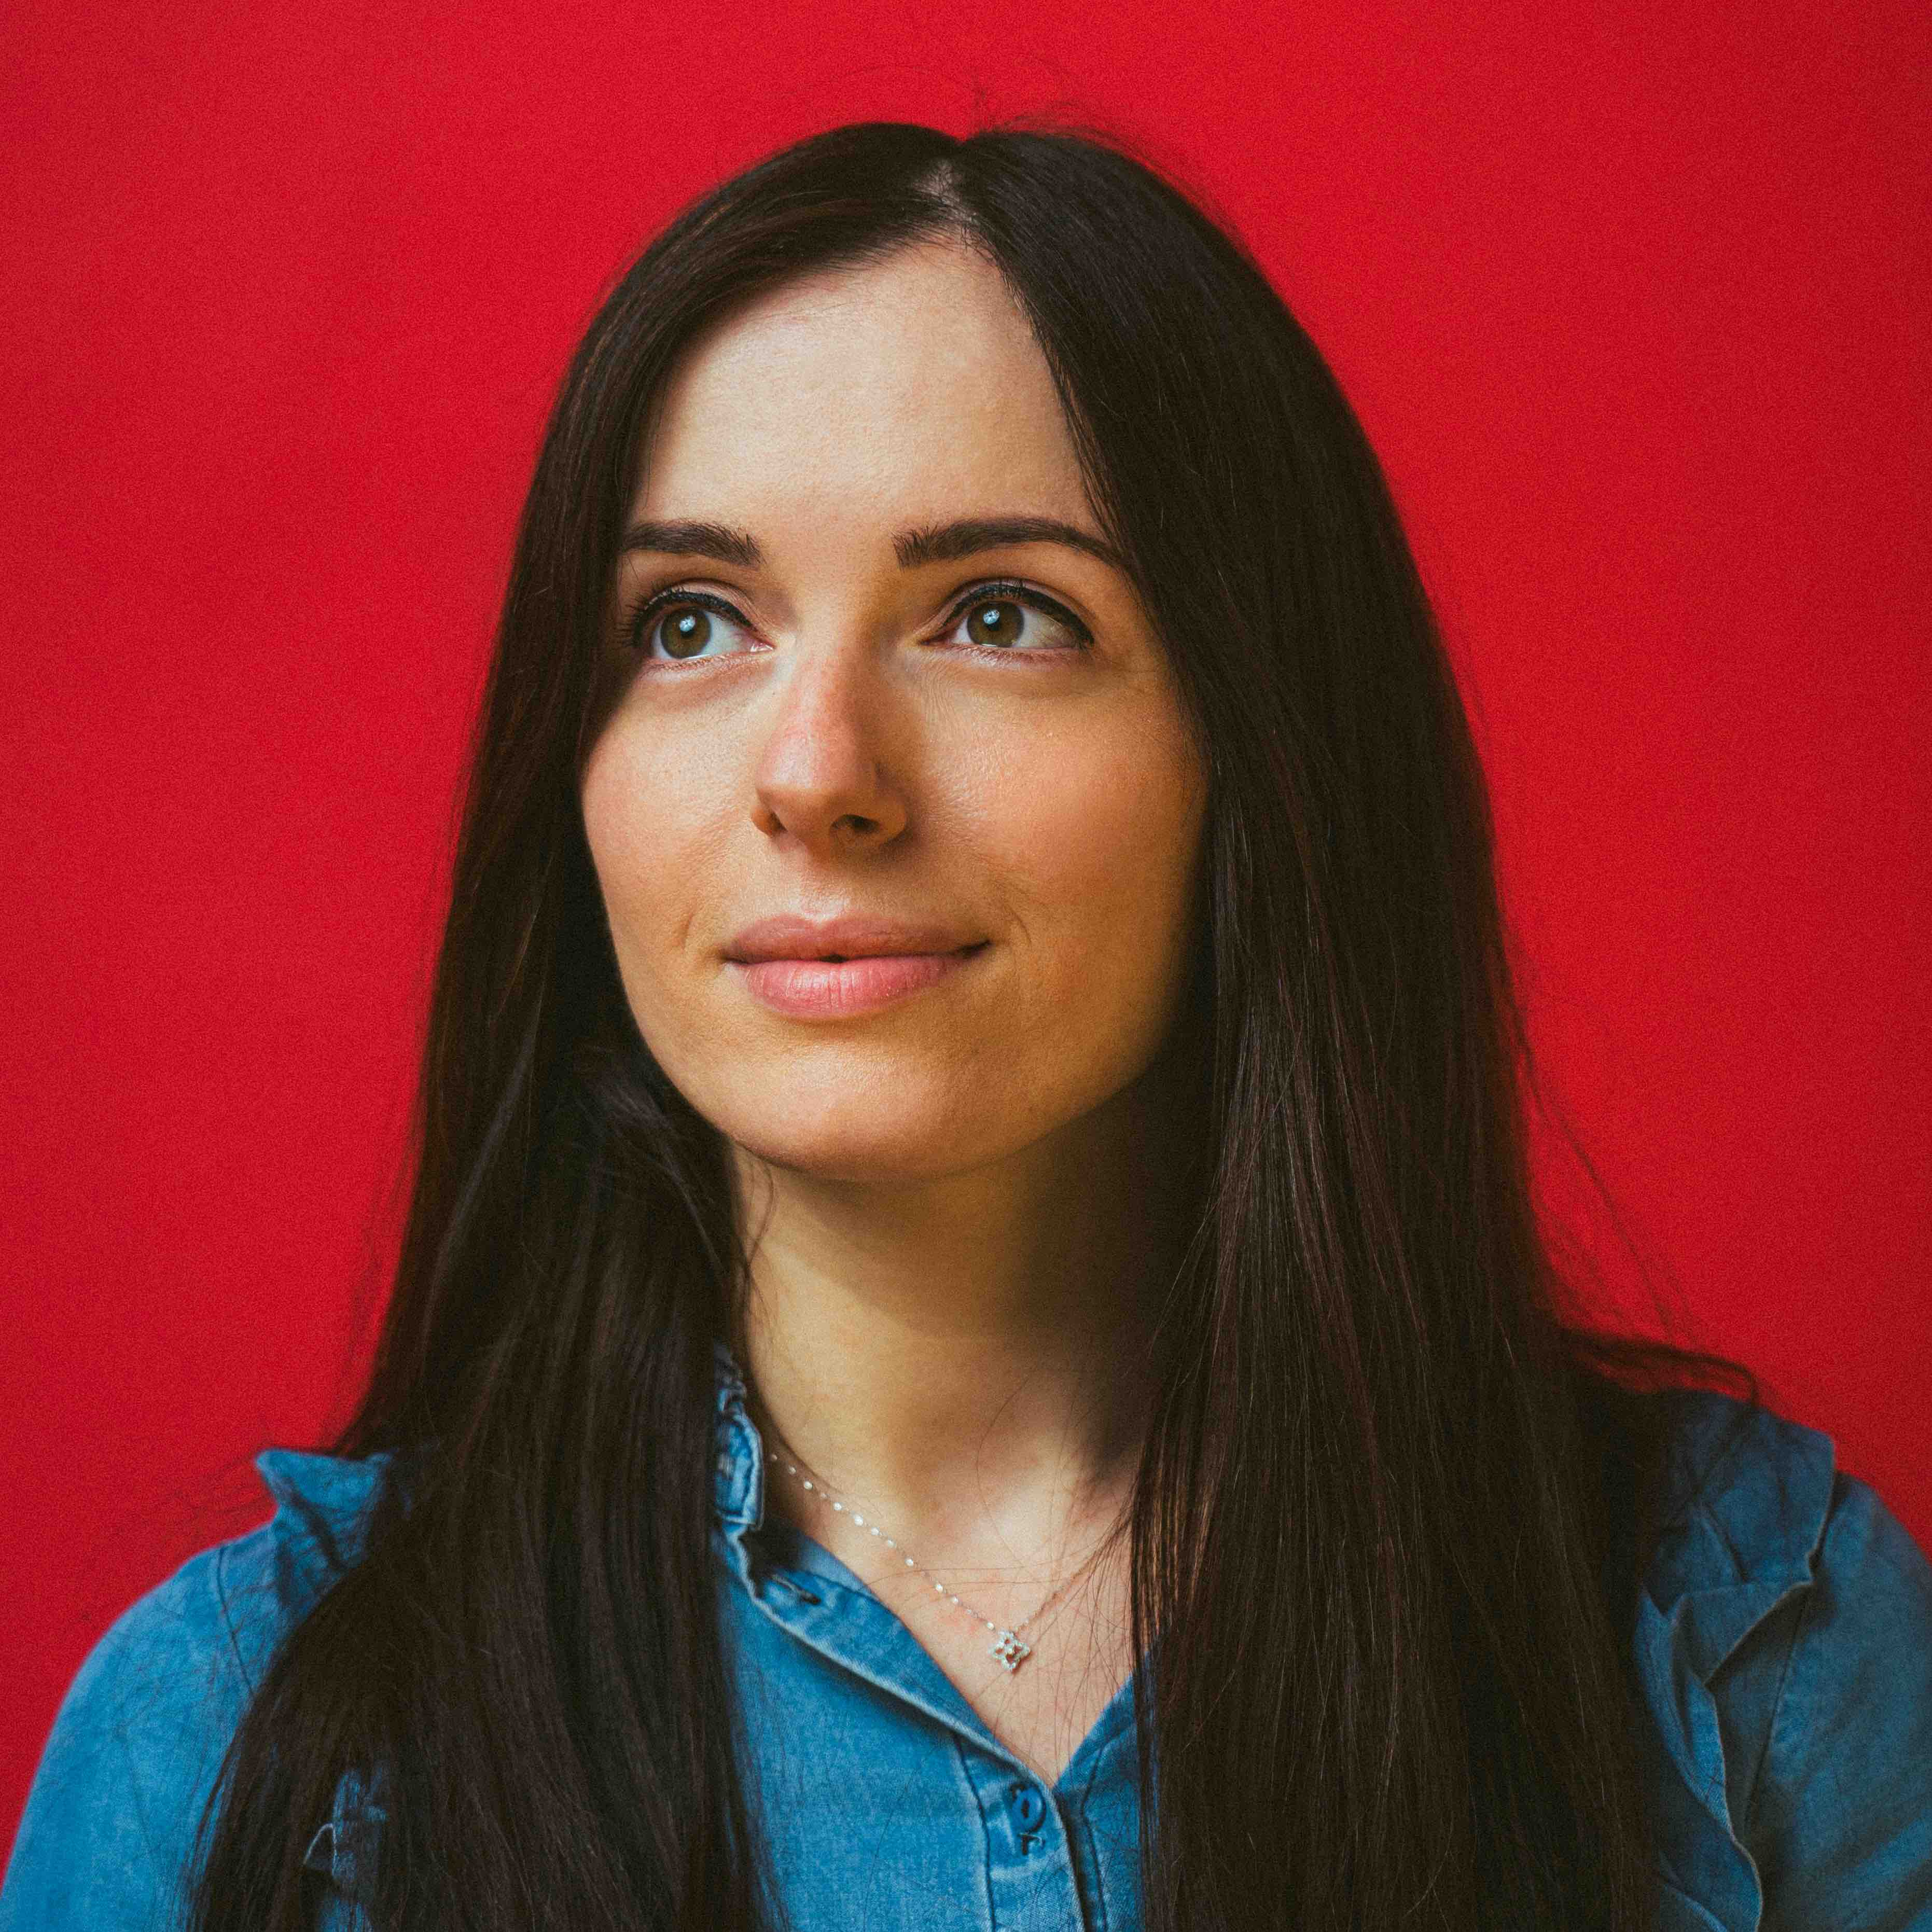 Adeline Perrigault